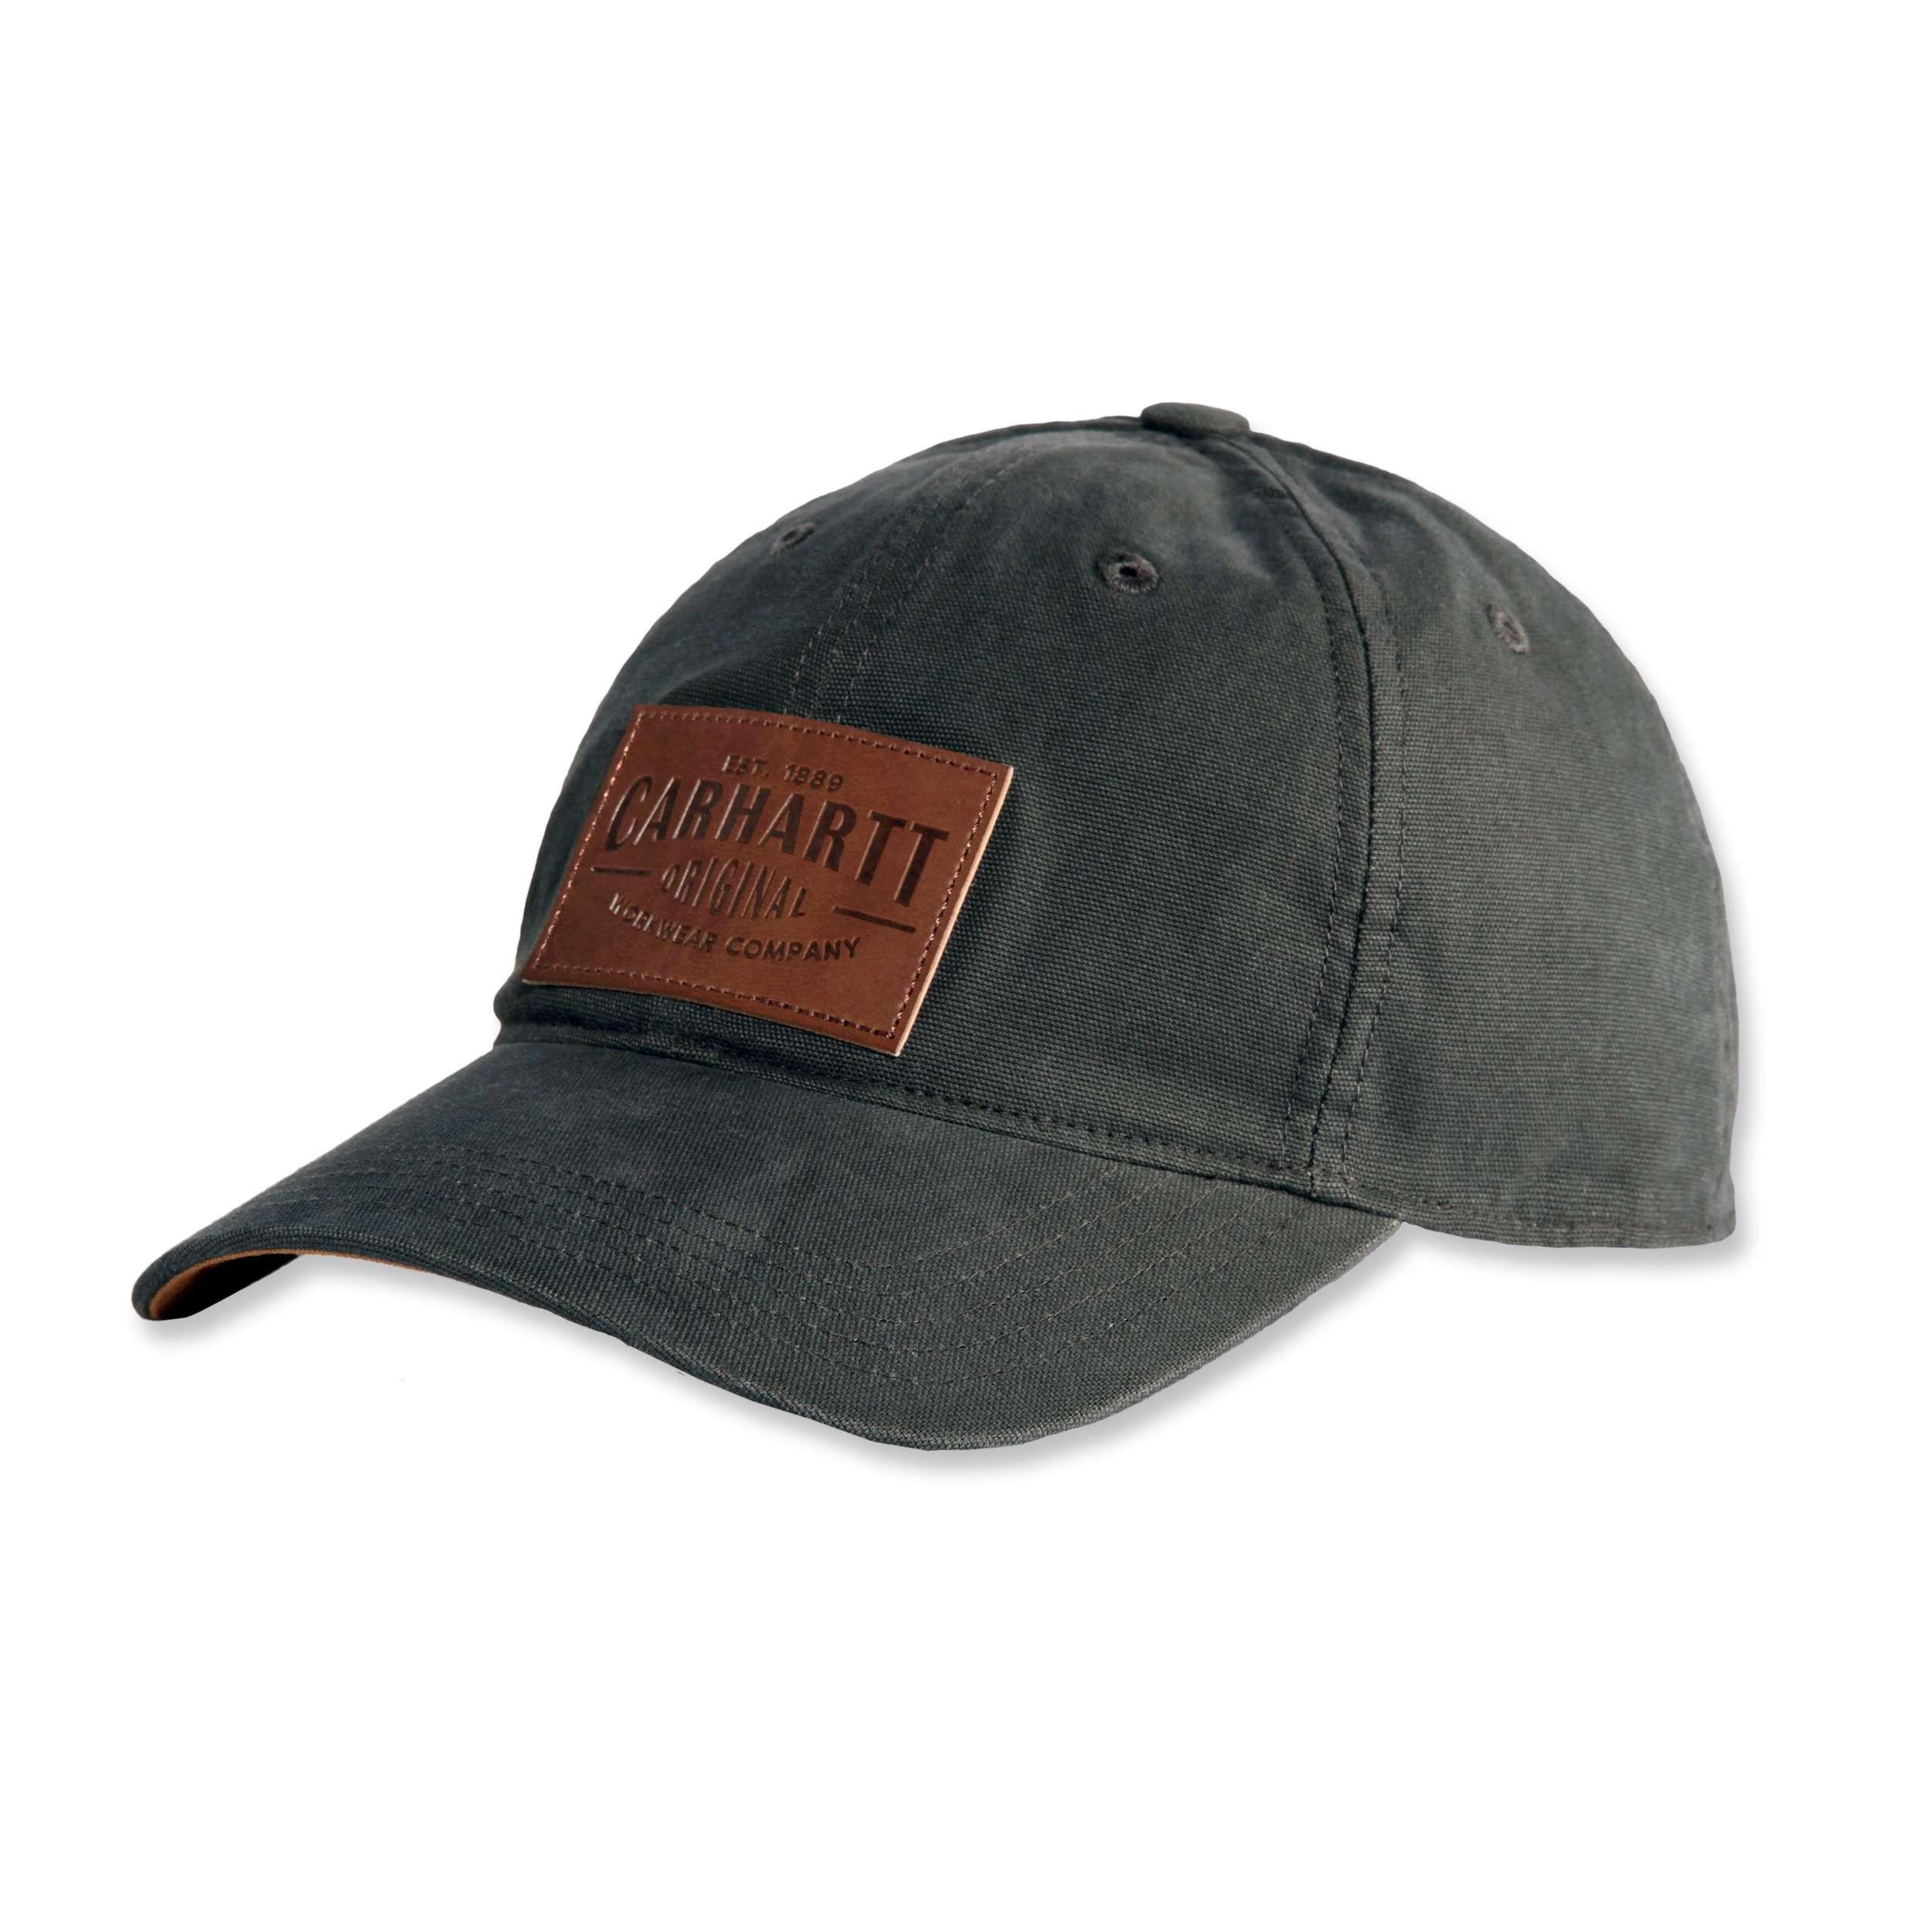 Кепка Carhartt Rigby Stretch Fit Leatherette Patch Cap - 103534 (Peat, M/L)